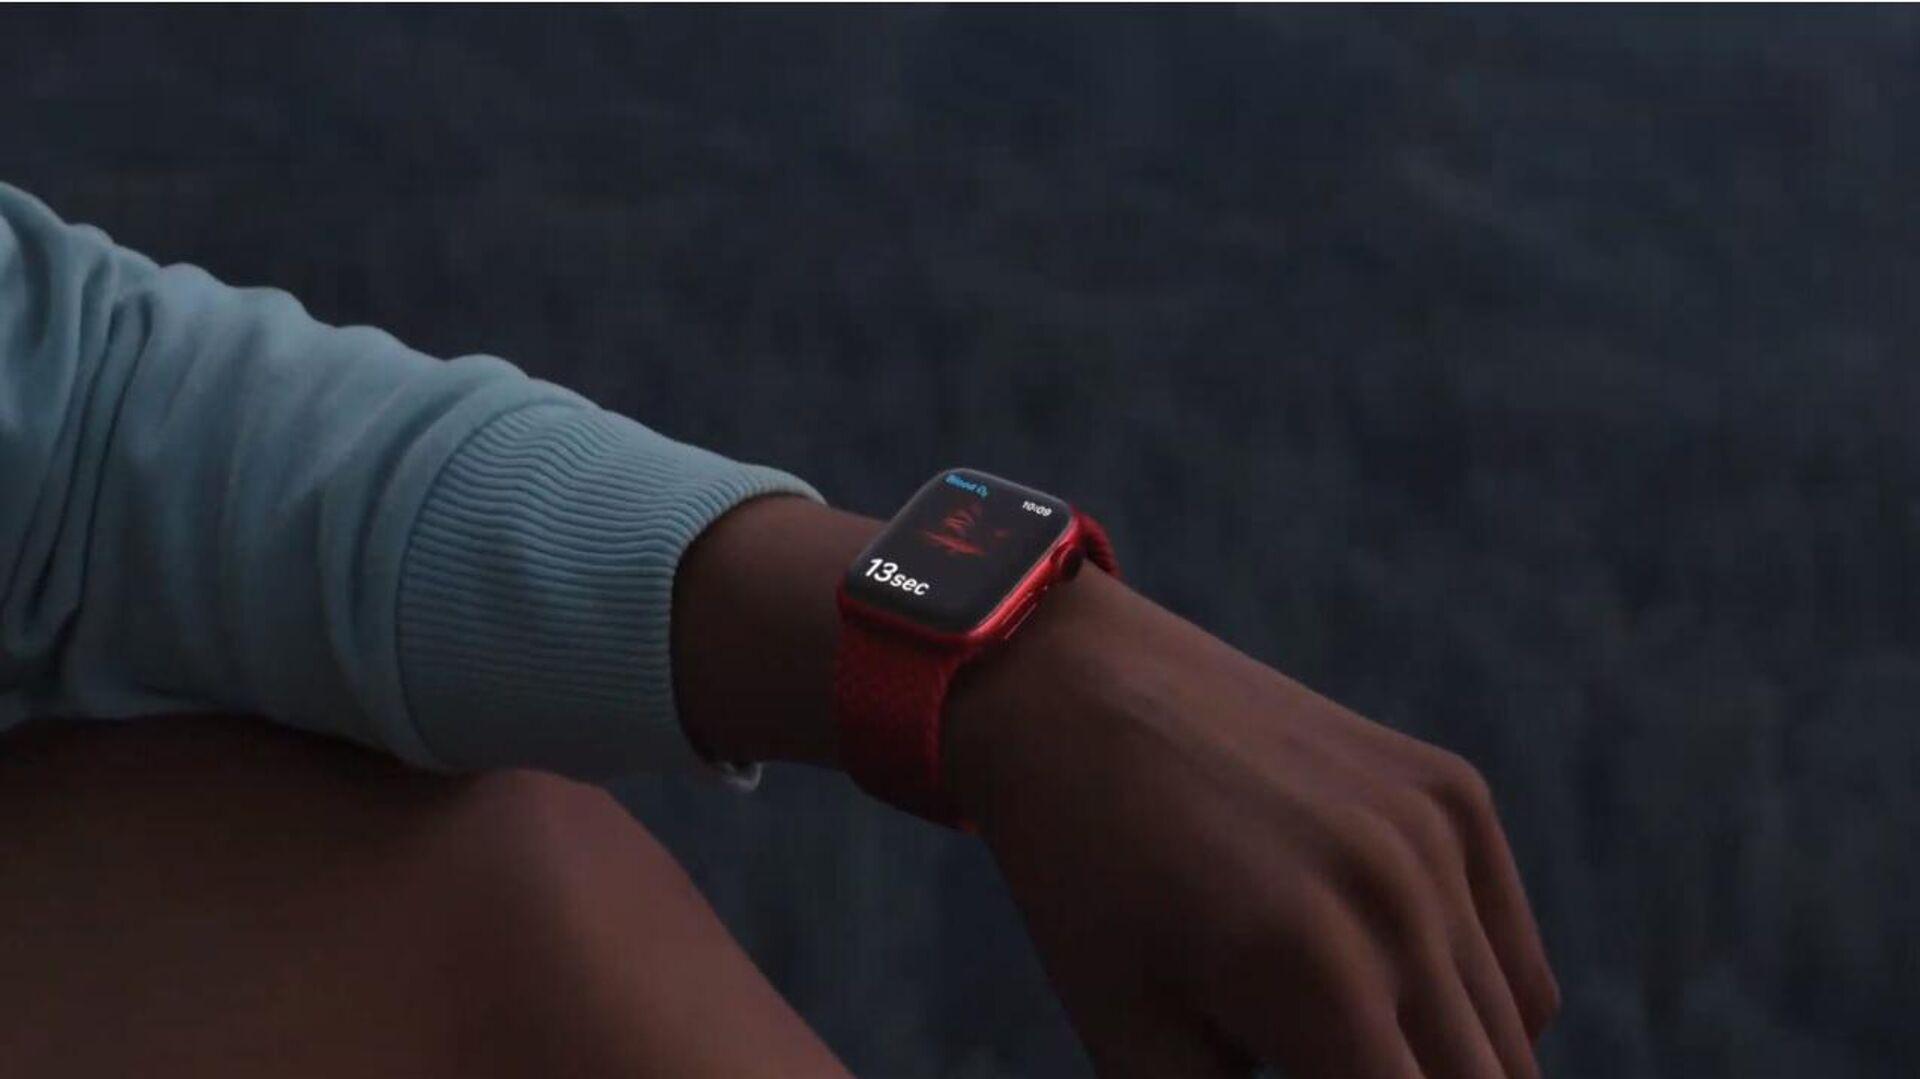 Apple Watch Series 6 - РИА Новости, 1920, 15.09.2020